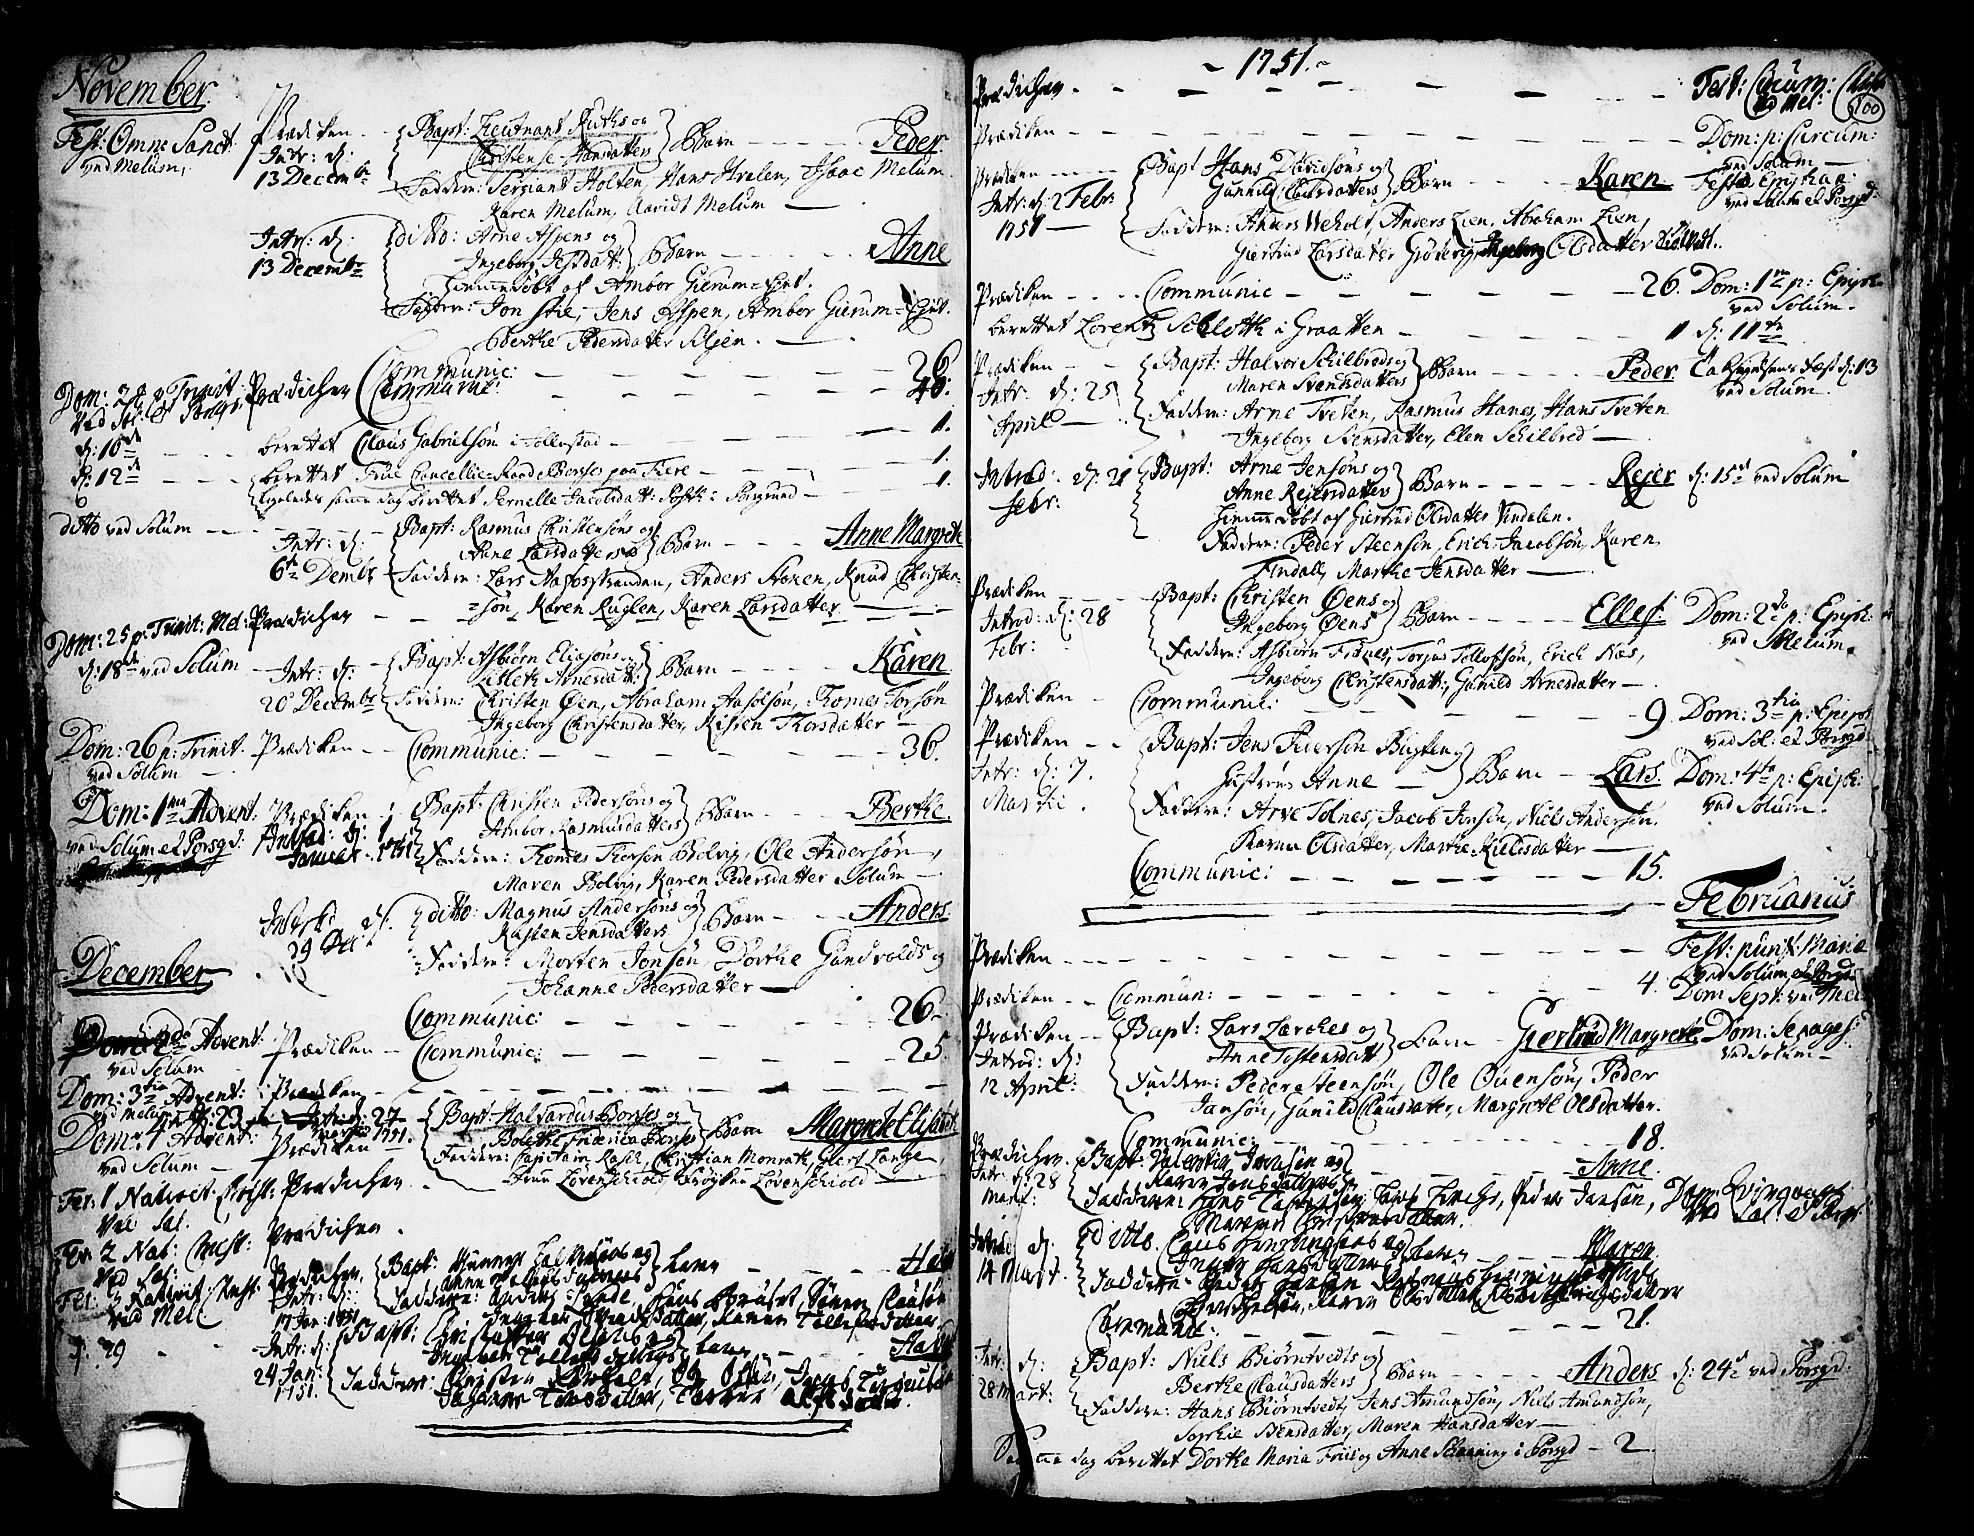 SAKO, Solum kirkebøker, F/Fa/L0002: Ministerialbok nr. I 2, 1713-1761, s. 100